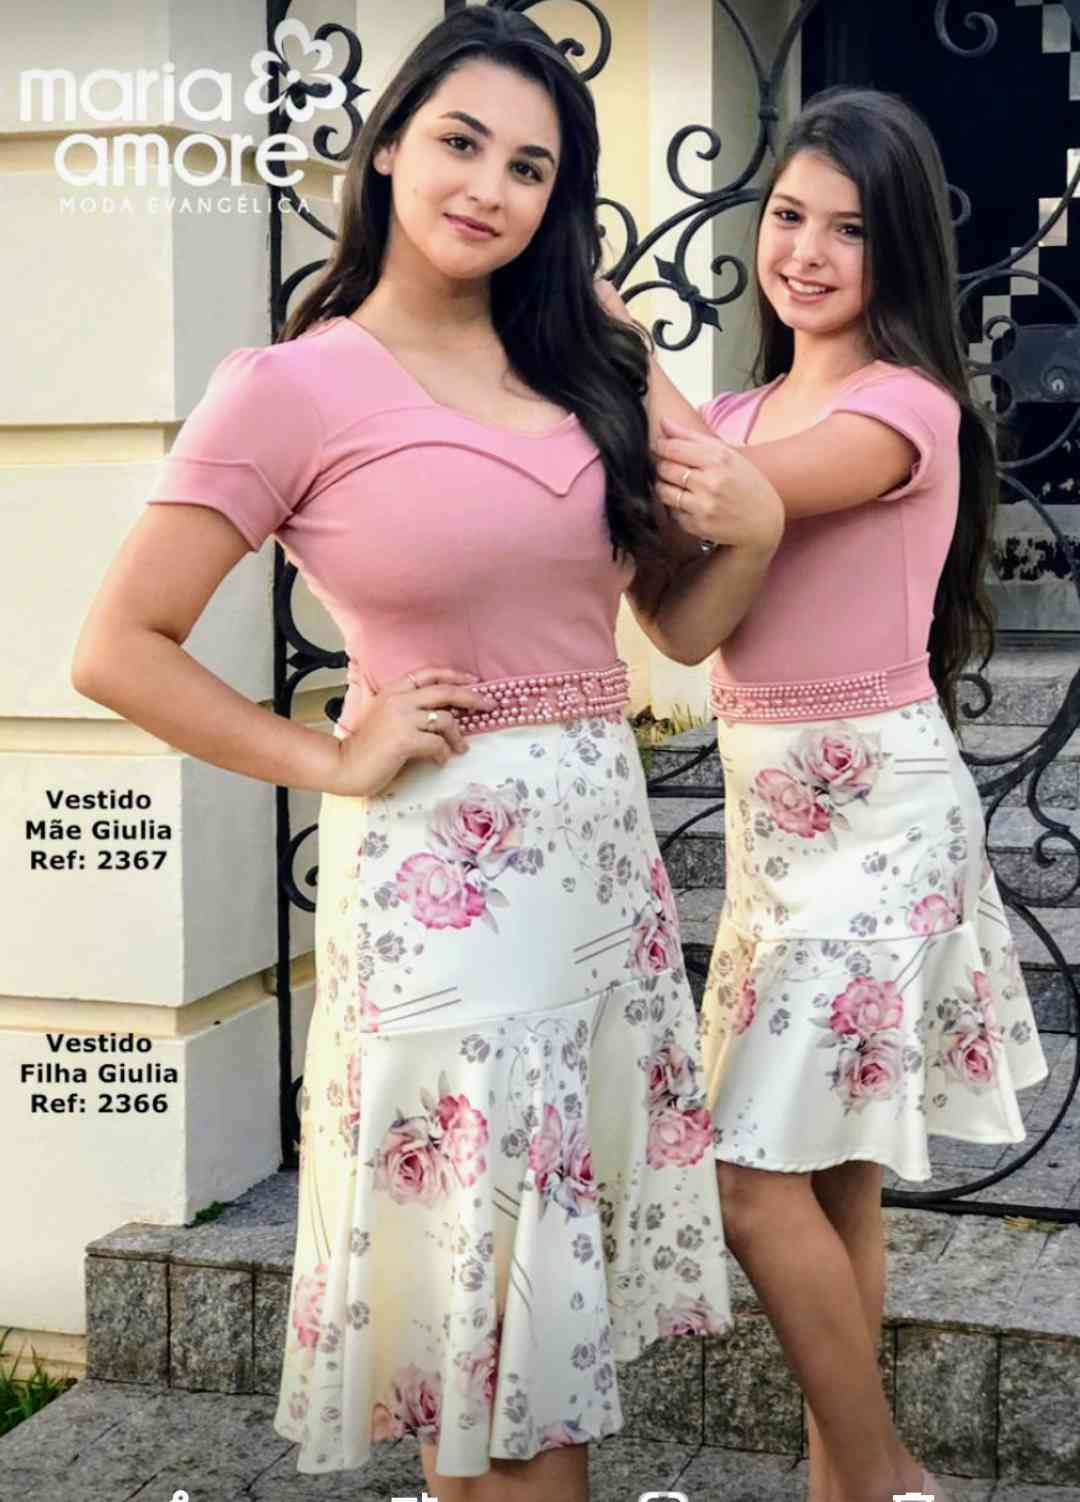 Vestido Duo C Cinto bordado - Maria Amore (2367 E)